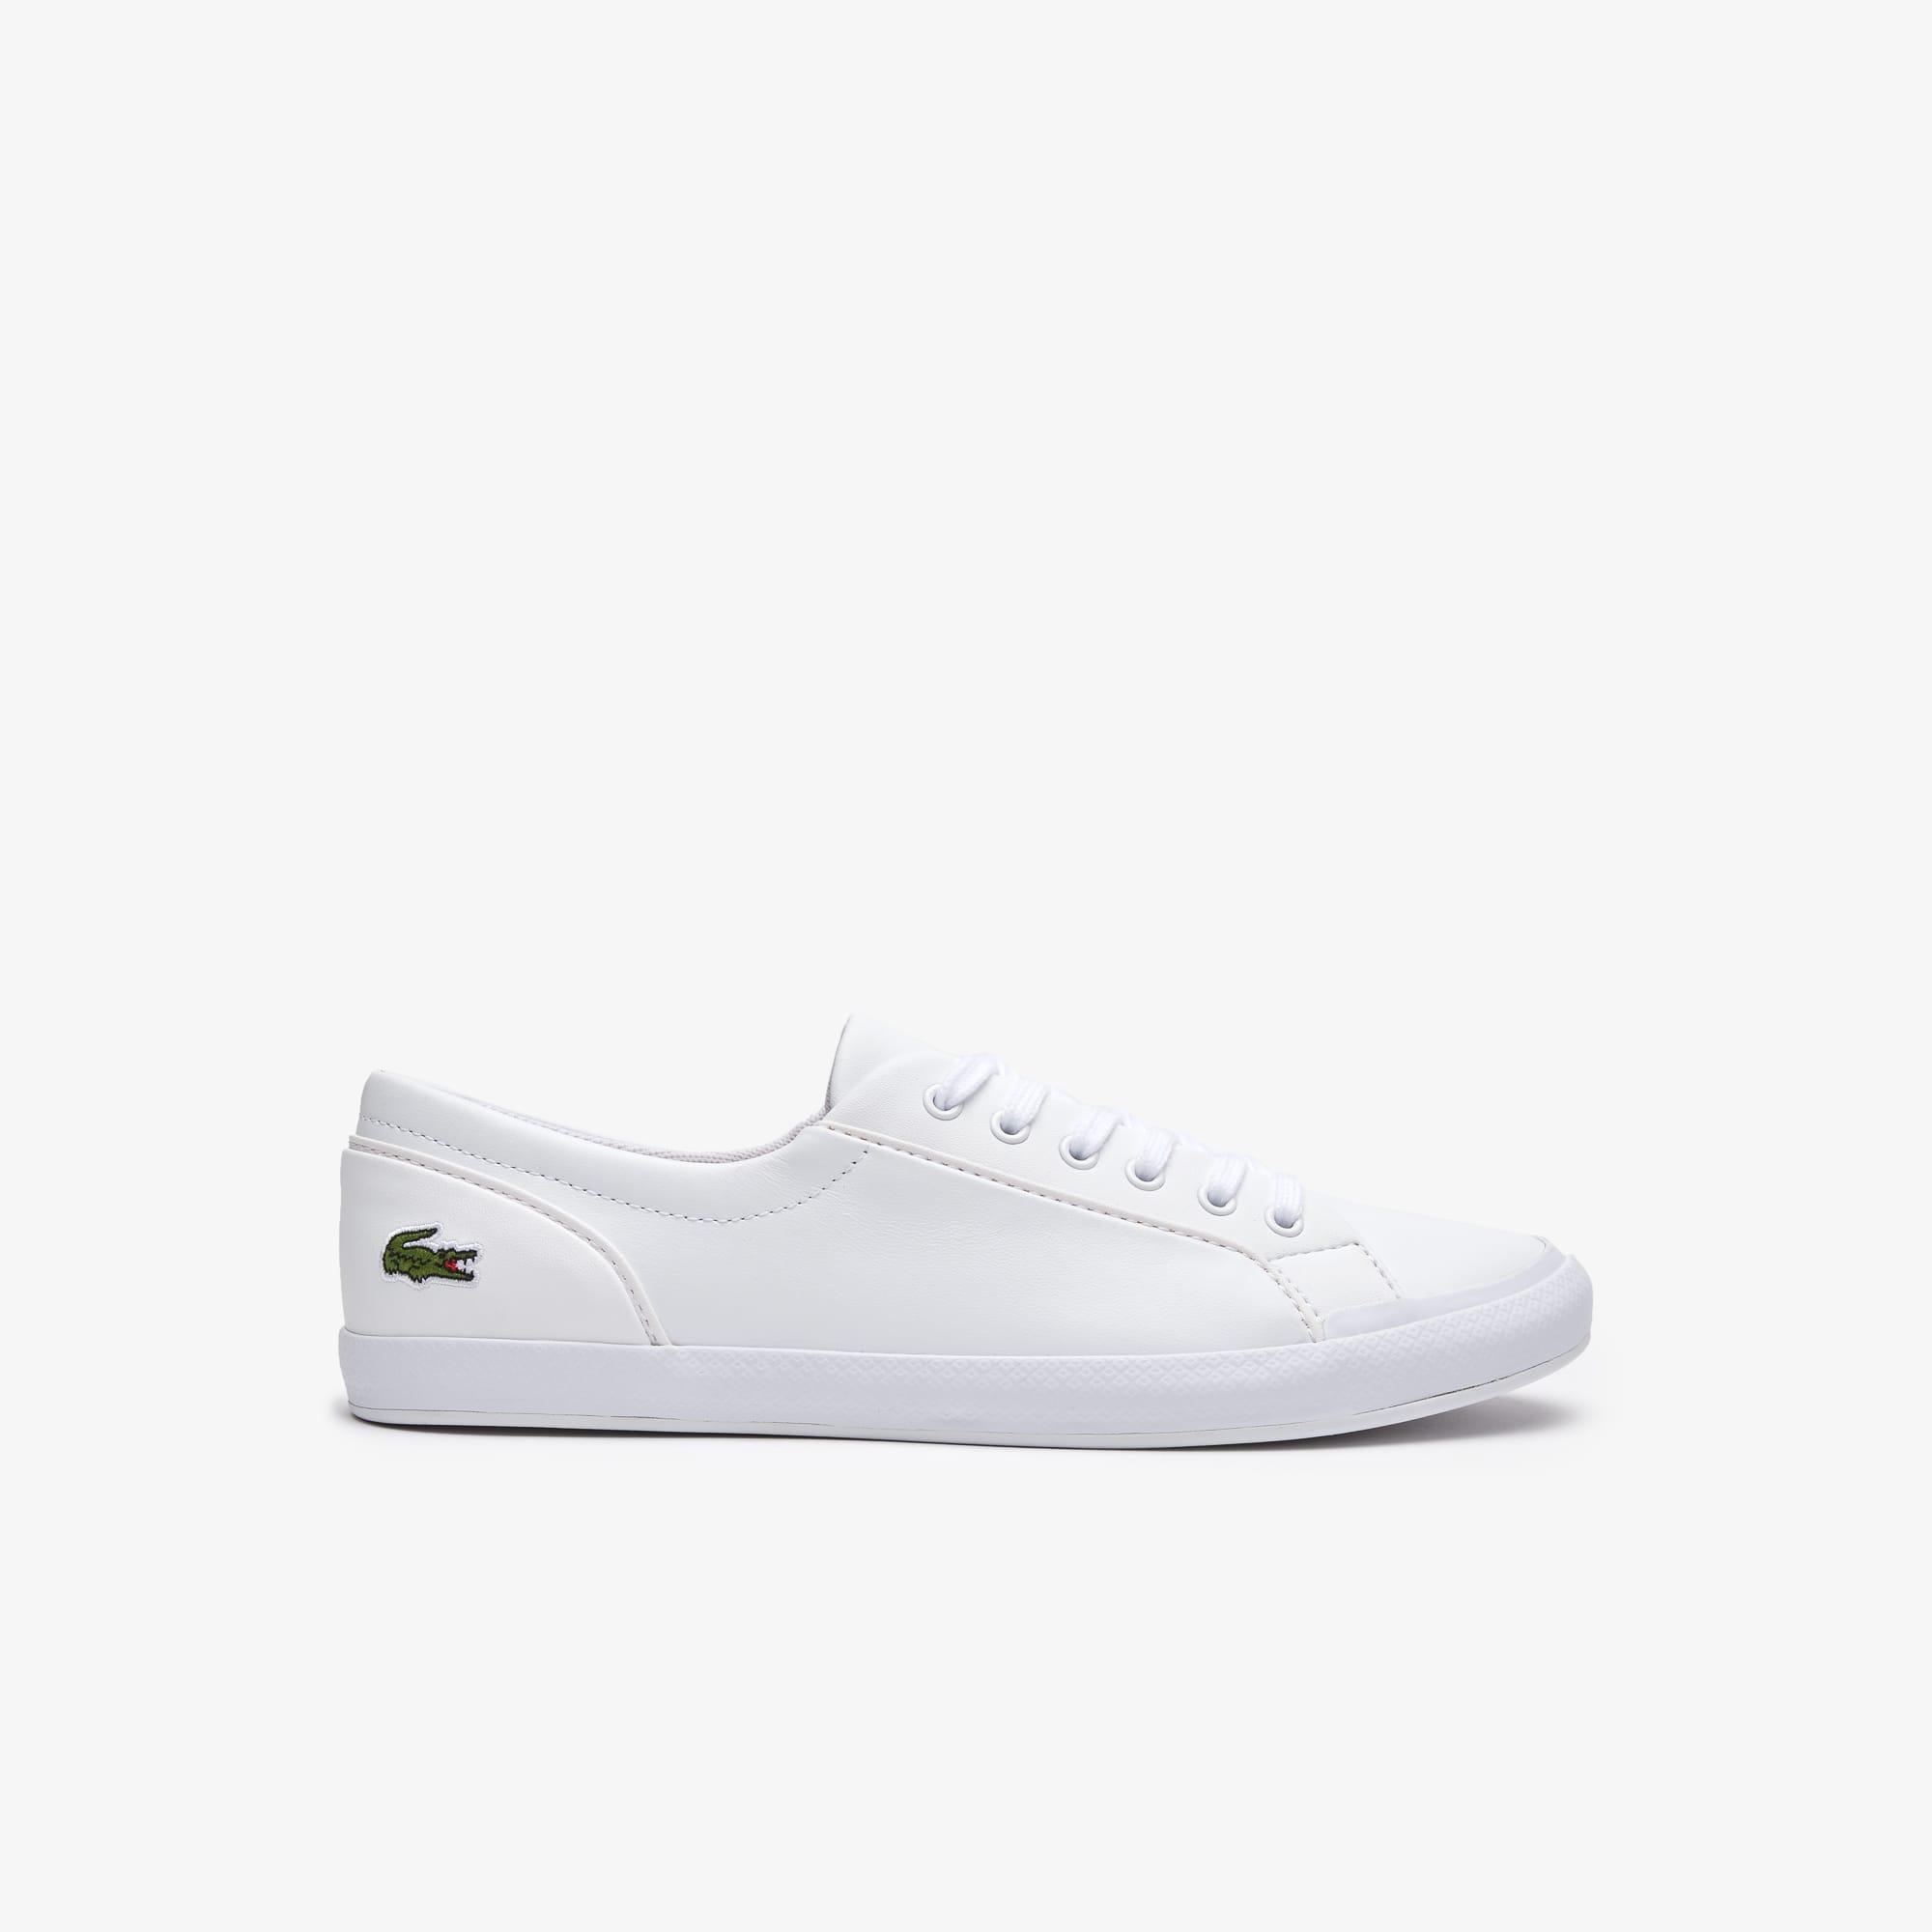 Lancelle BL Damessneakers van Leer